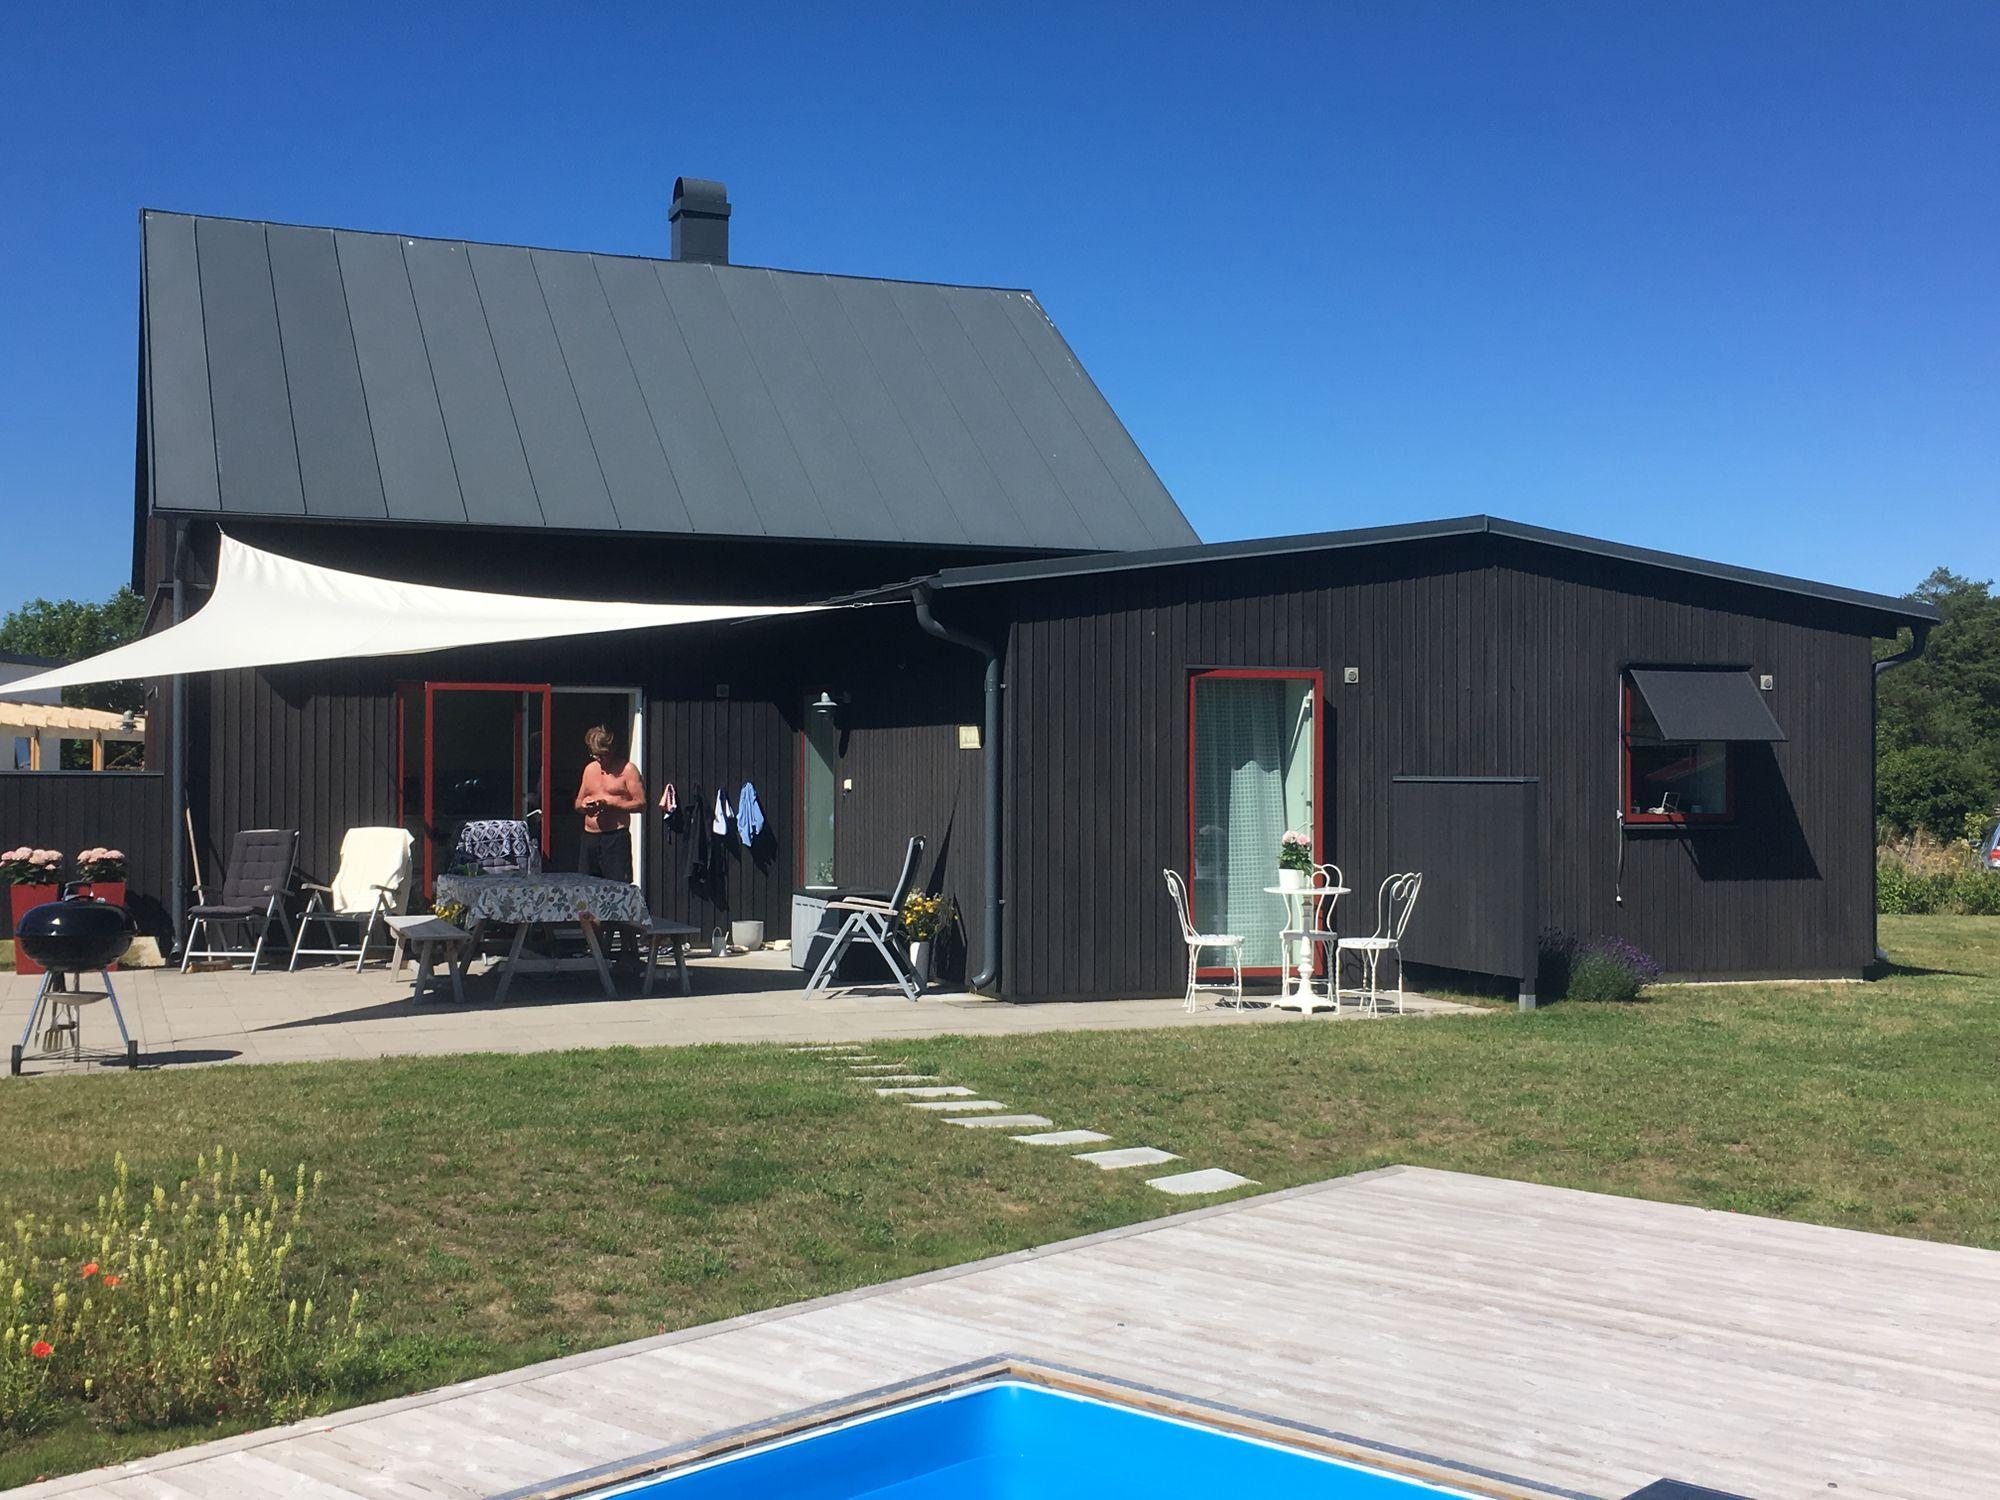 hyra hus gotland pool